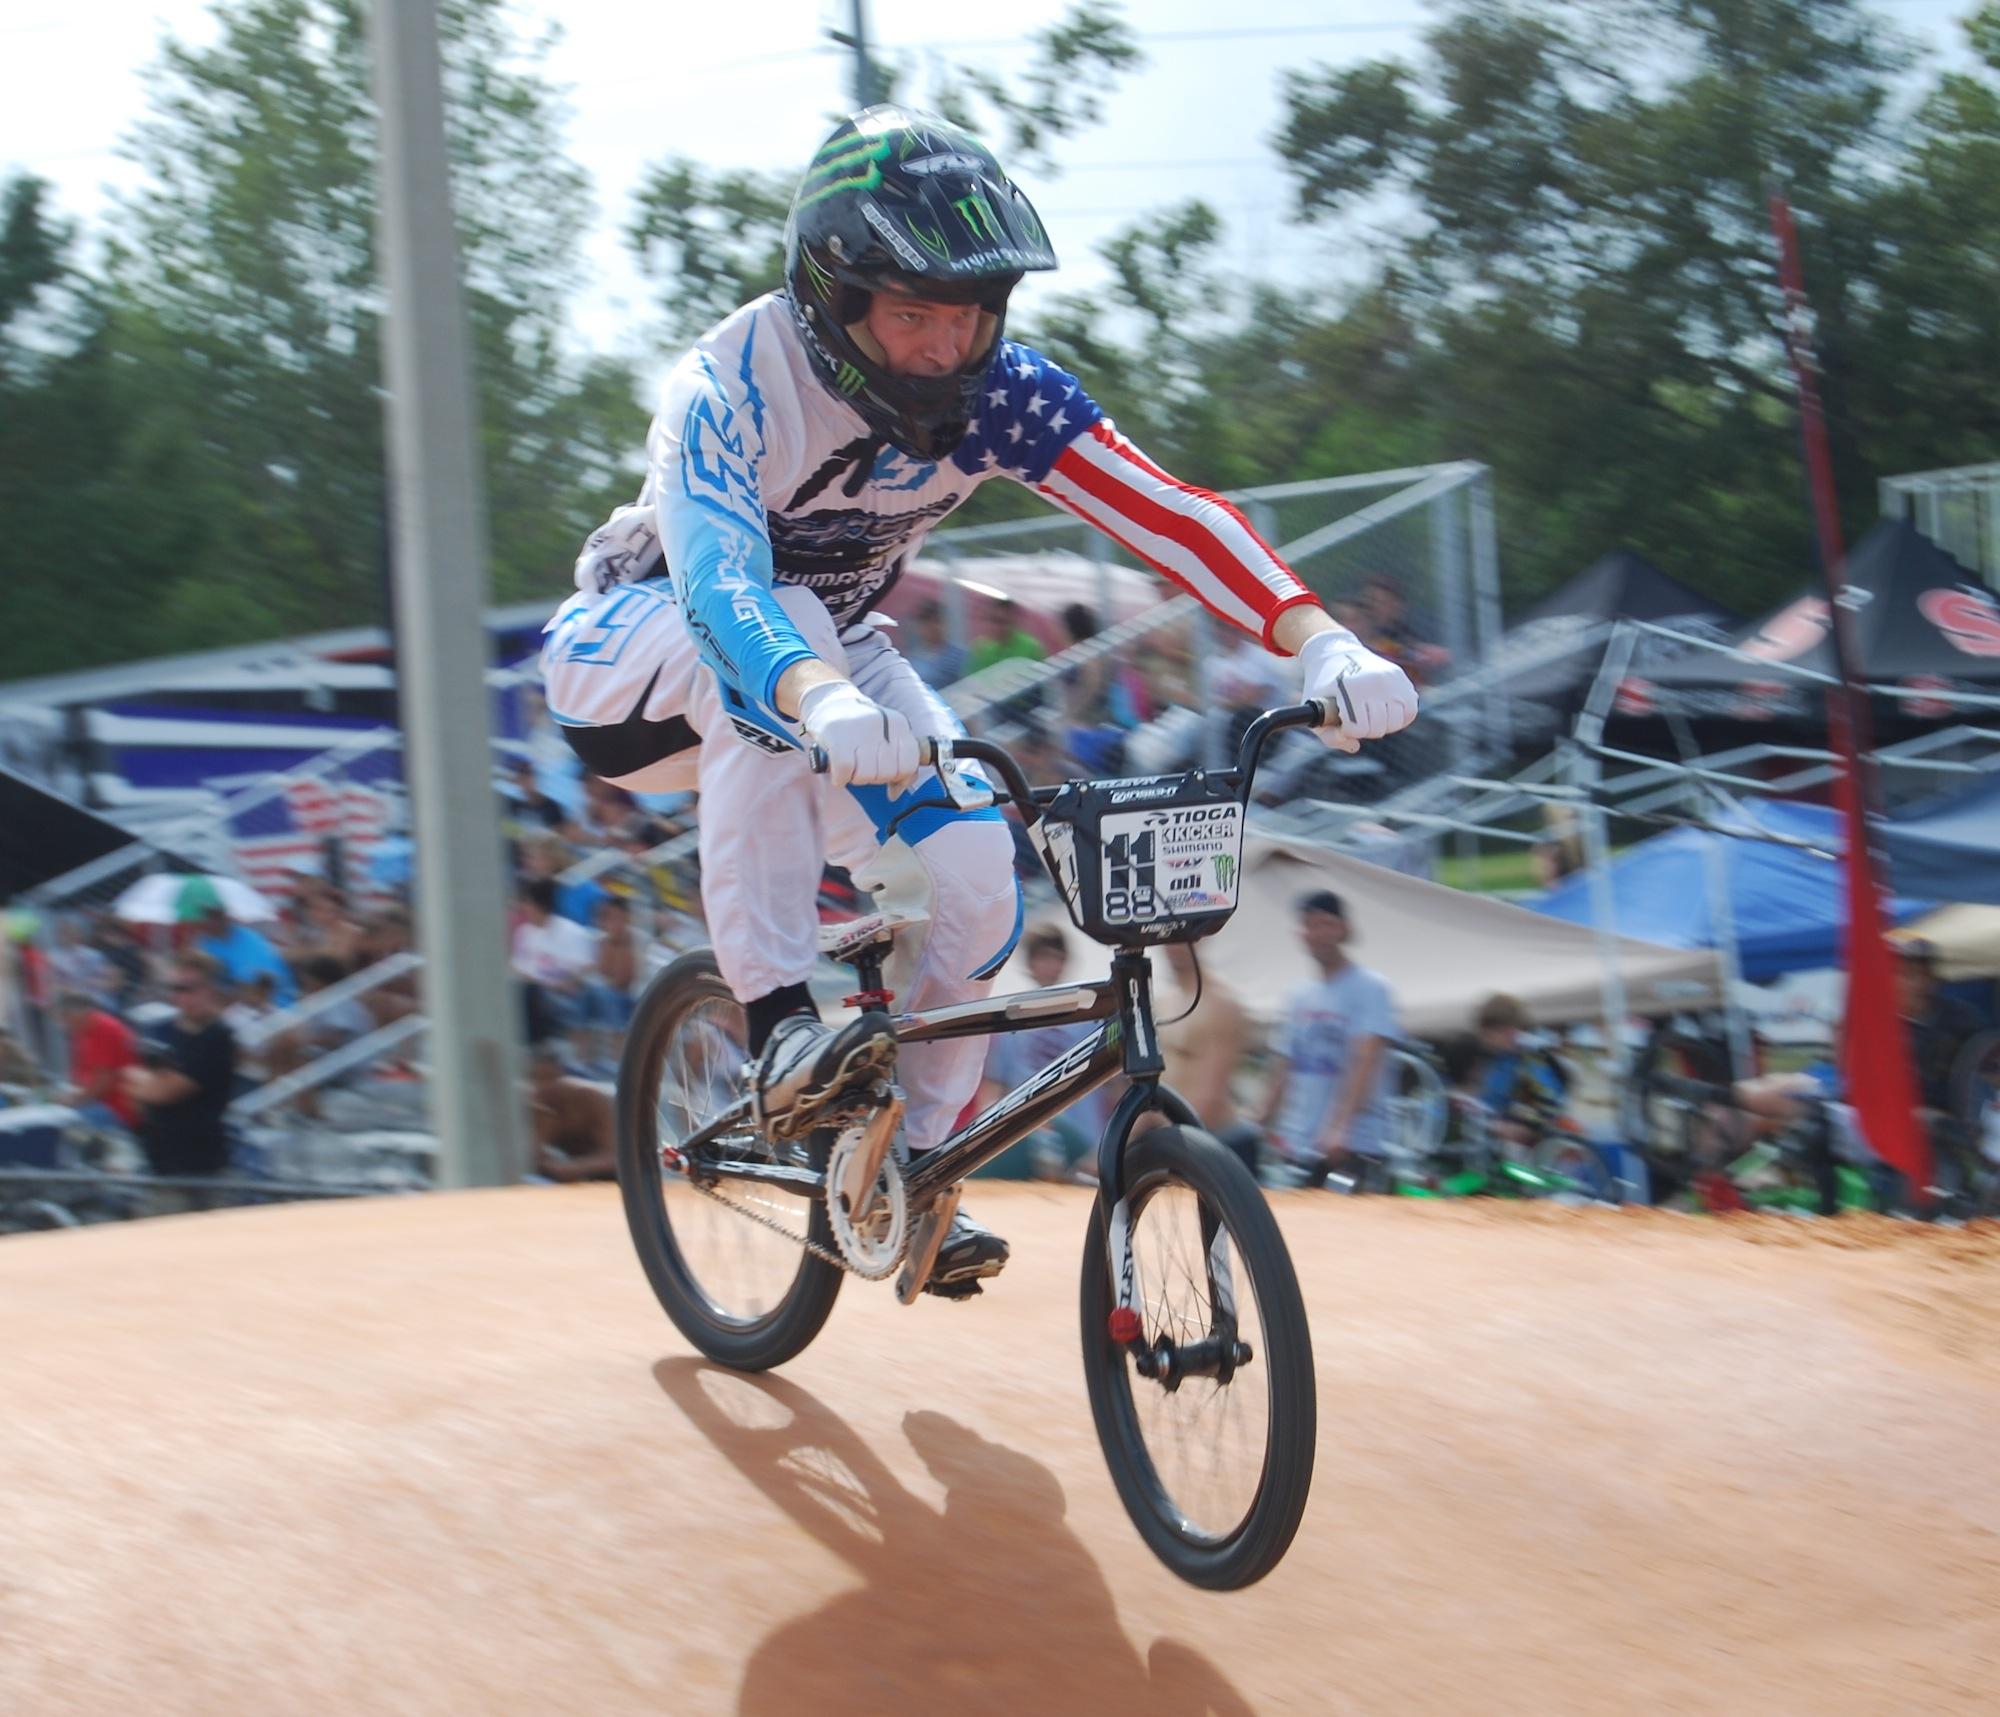 Connor Fields Photos At Usa Bmx Disney Cup In Orlando Bmx Racing